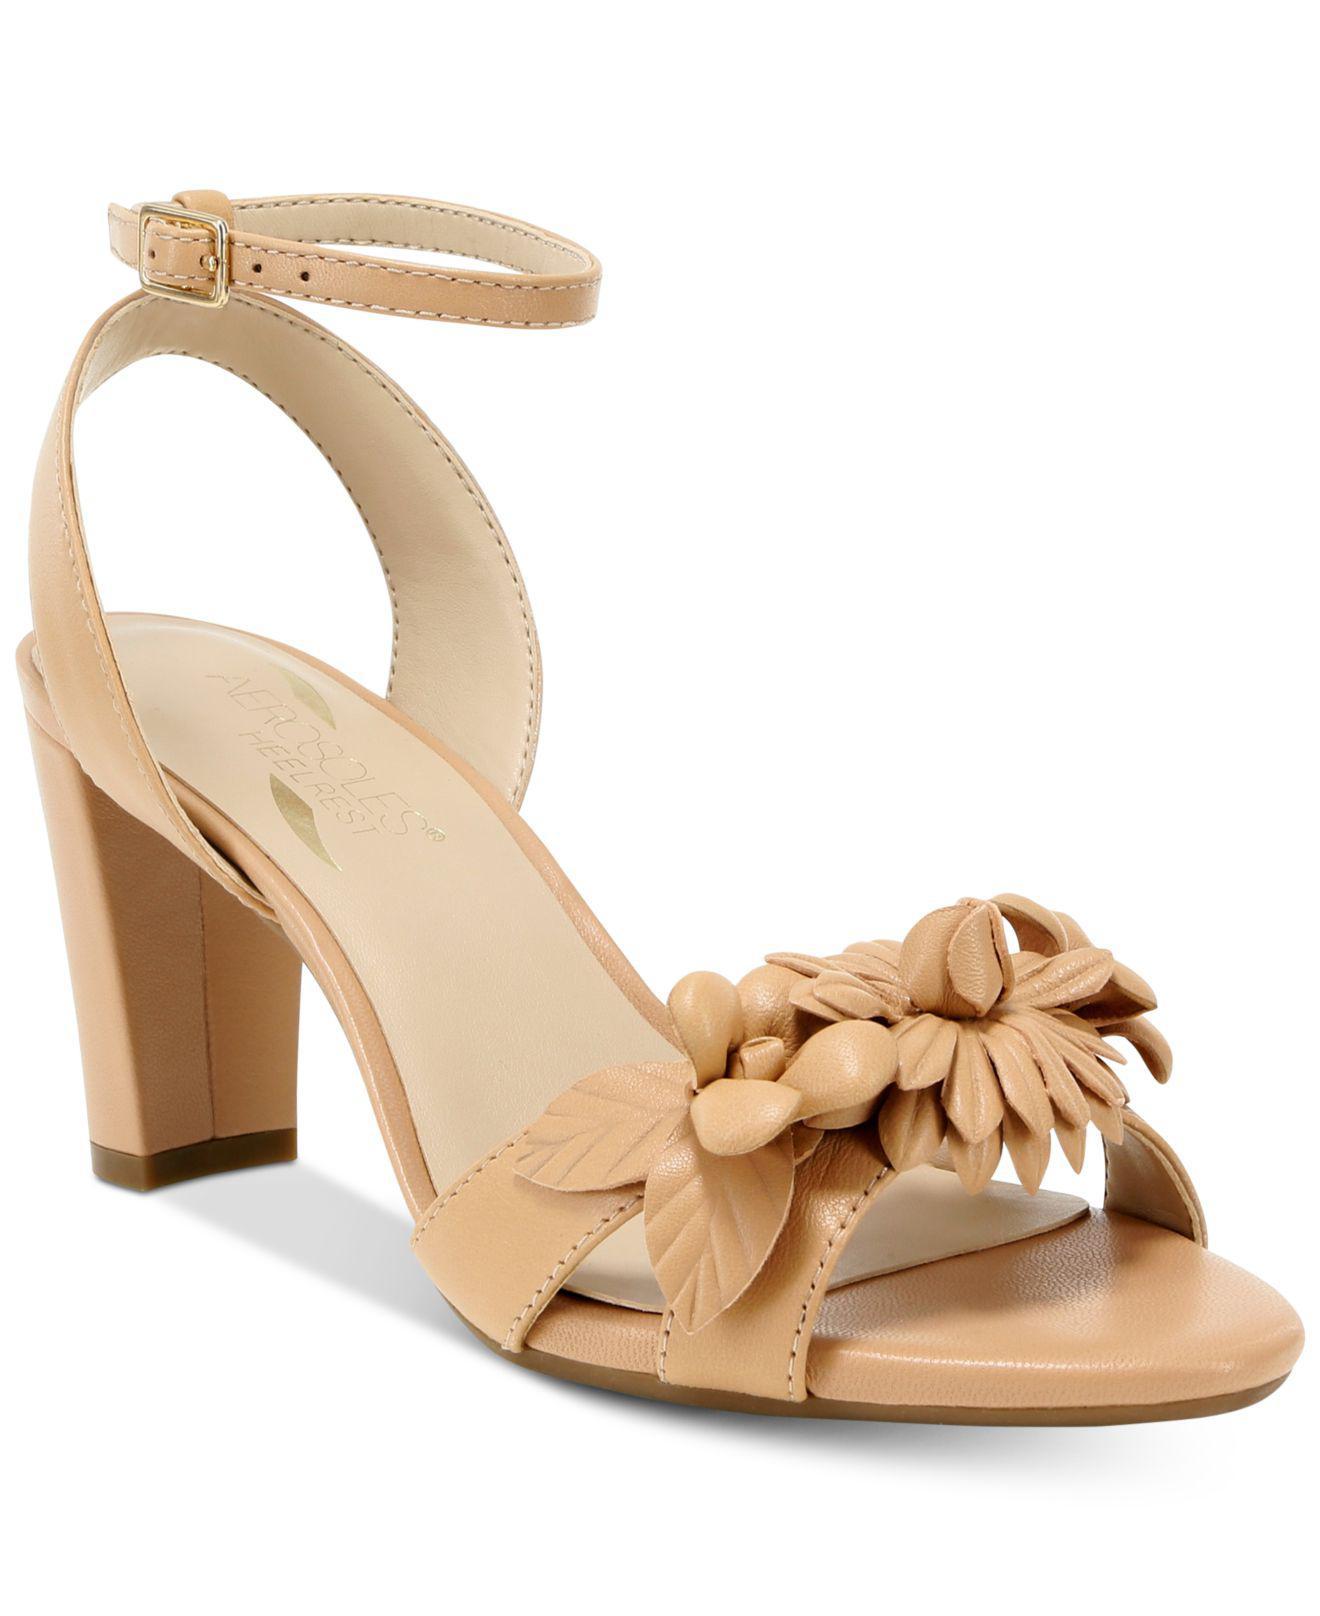 Aerosoles Hit The Road Dress Sandals Women's Shoes xdEBoeg